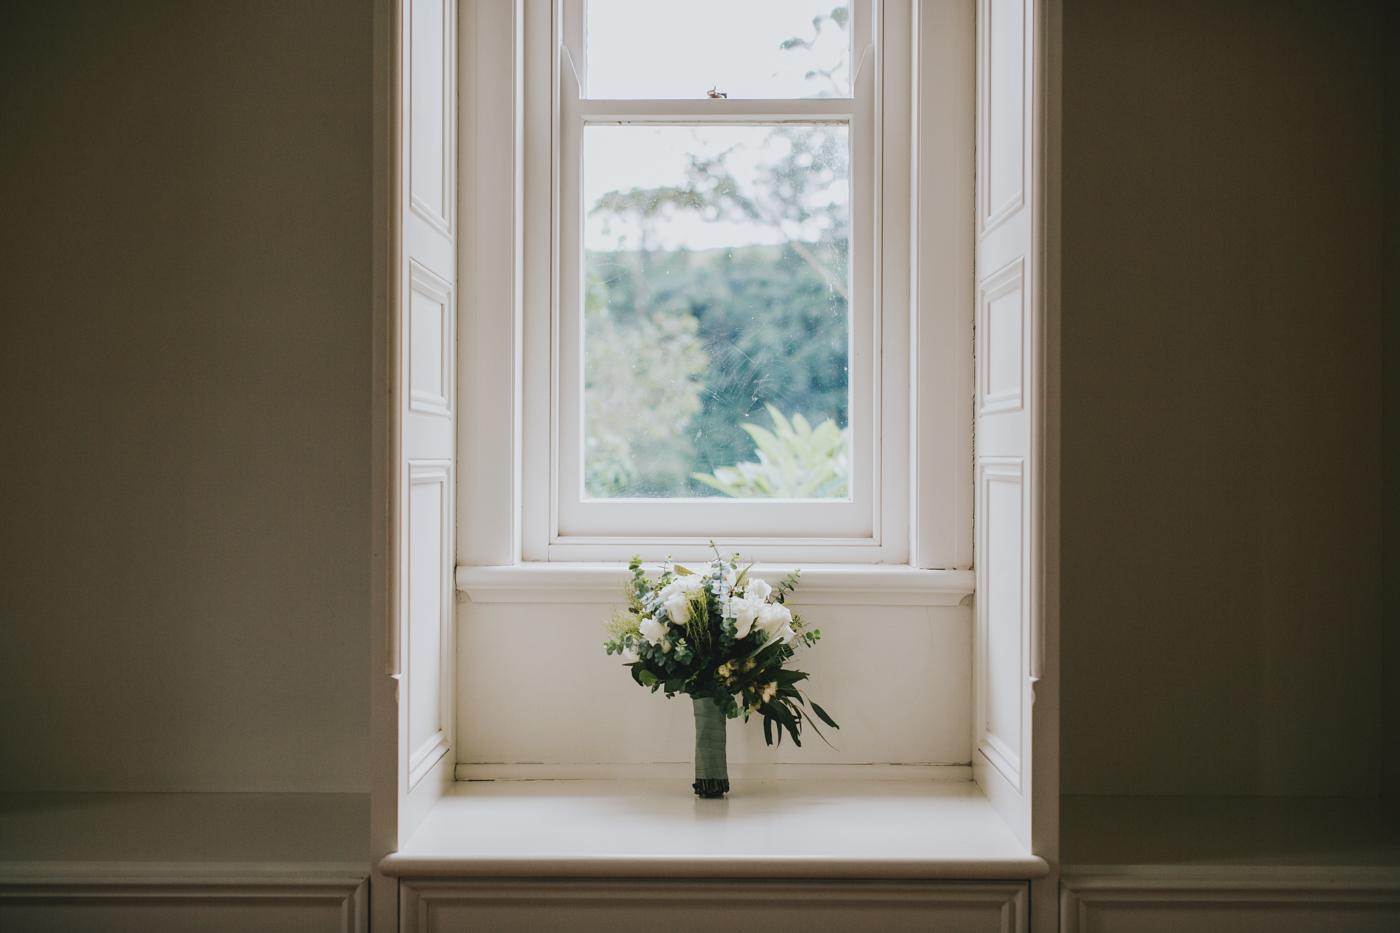 Rachel & Jacob - Willow Farm Berry - South Coast Wedding - Samantha Heather Photography-24.jpg